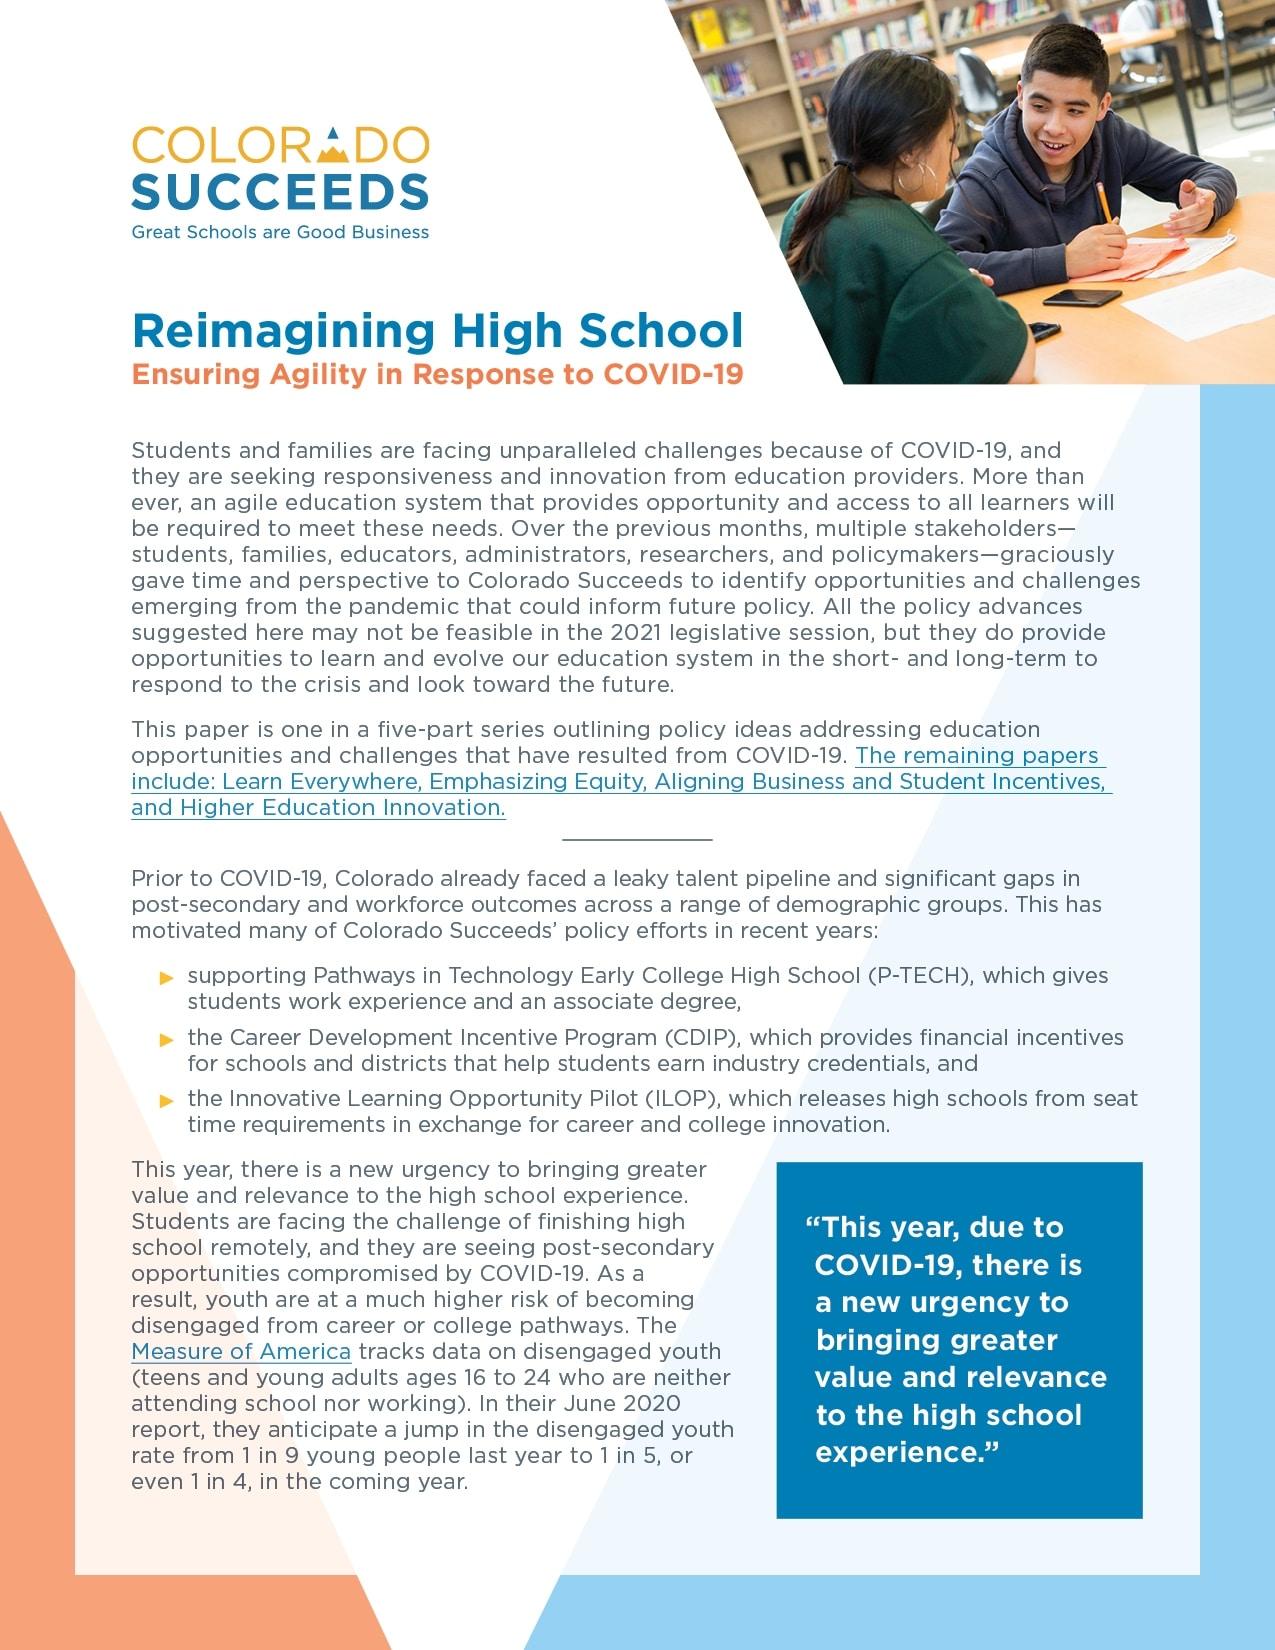 Colorado Succeeds PolicyPaper 2020 Reimagining High School